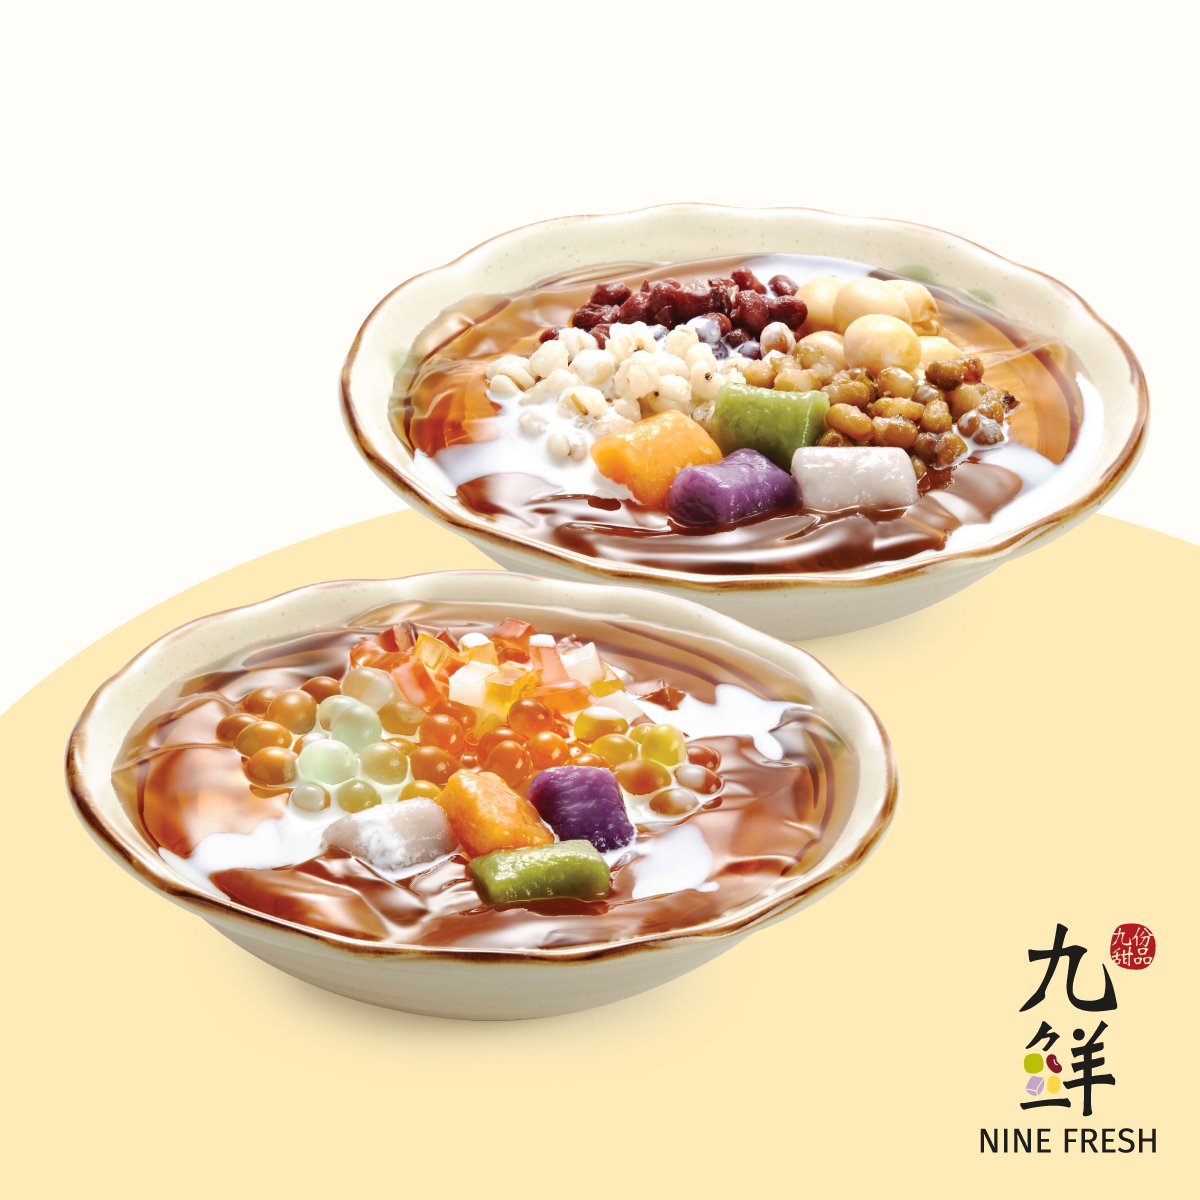 2 x Ai-Yu Jelly Desserts at Nine Fresh - Get Deals, Cashback and Rewards with ShopBack GO